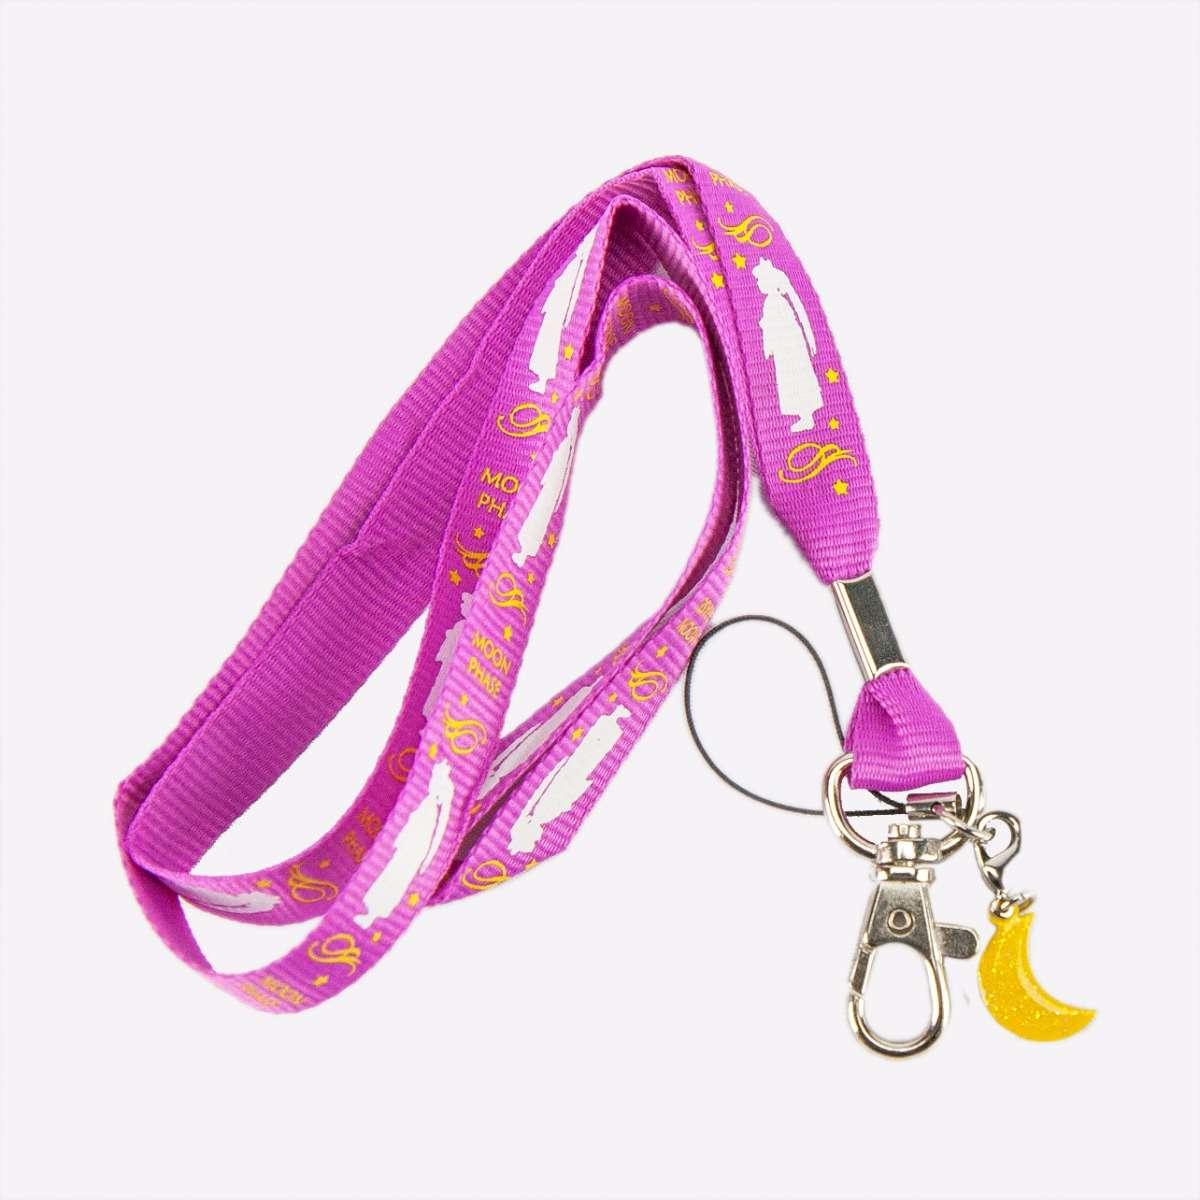 Hazuki Lanyard accessories